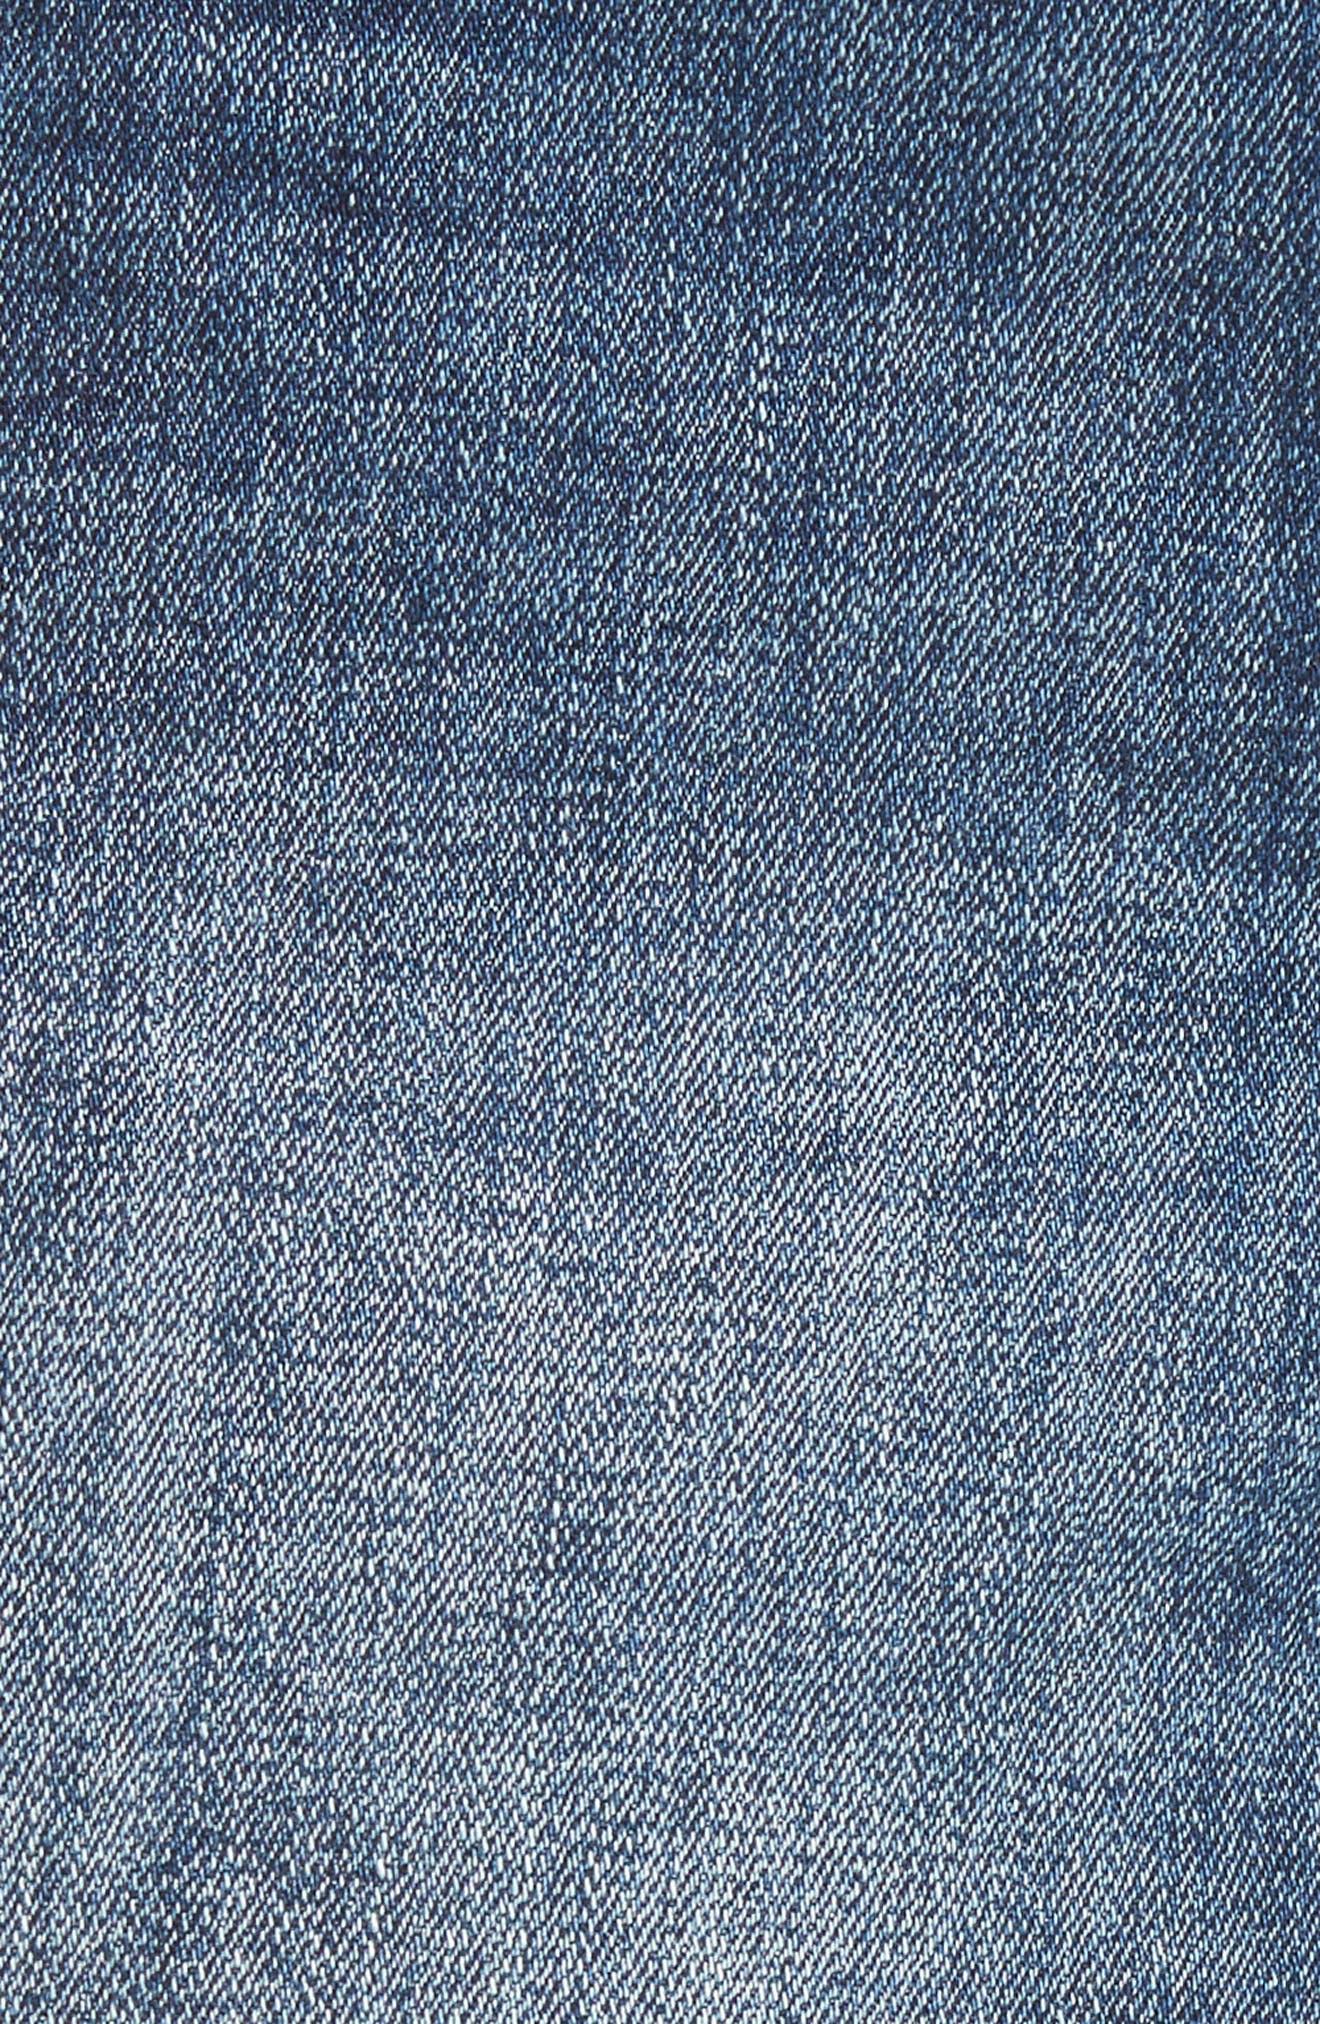 Karlie Cutoff Denim Boyfriend Shorts,                             Alternate thumbnail 5, color,                             Bluegrass